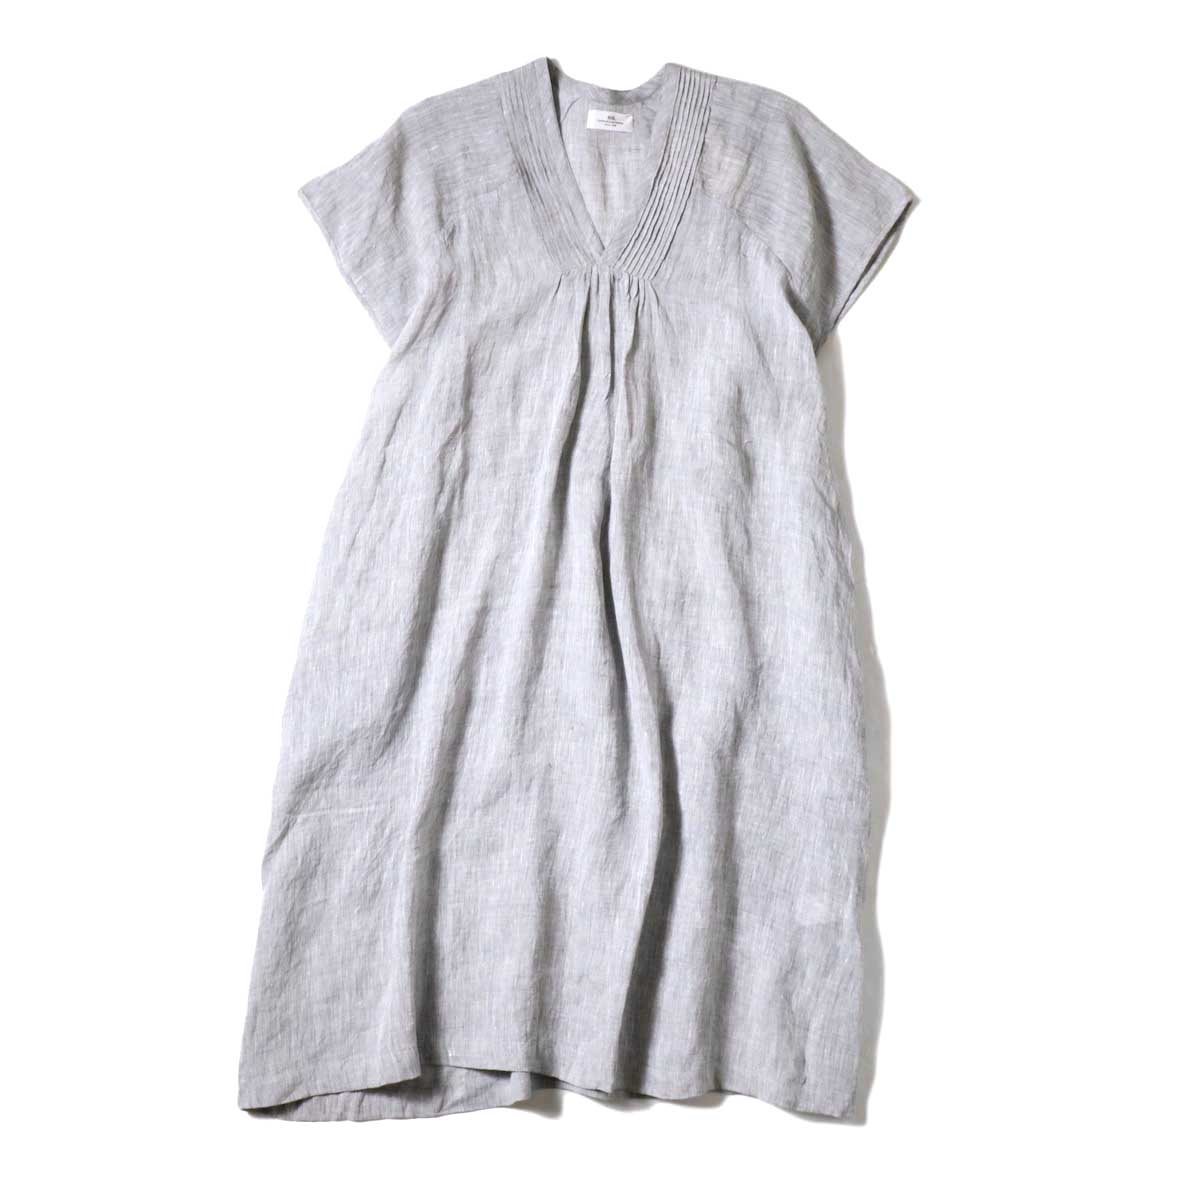 SOIL / V-NECK PINTUCK DREES (Grey) 正面